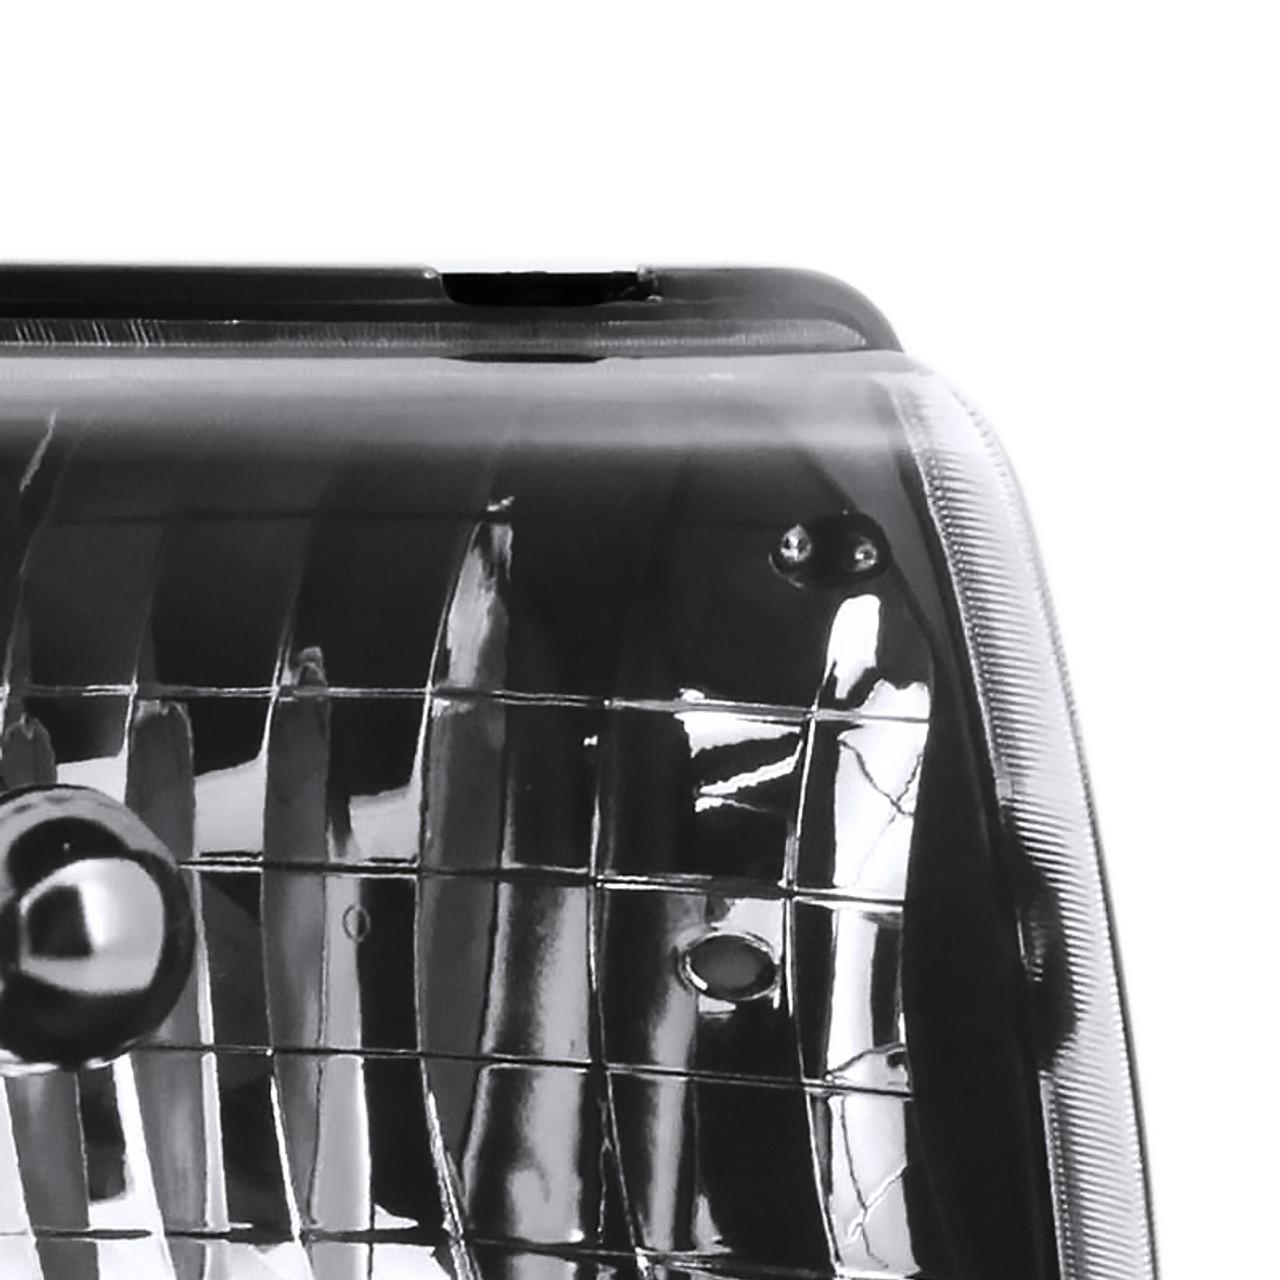 Solar Screen passgenaue T/önungsfolie Ford Focus Kombi Bj 2011-2019 Black 95